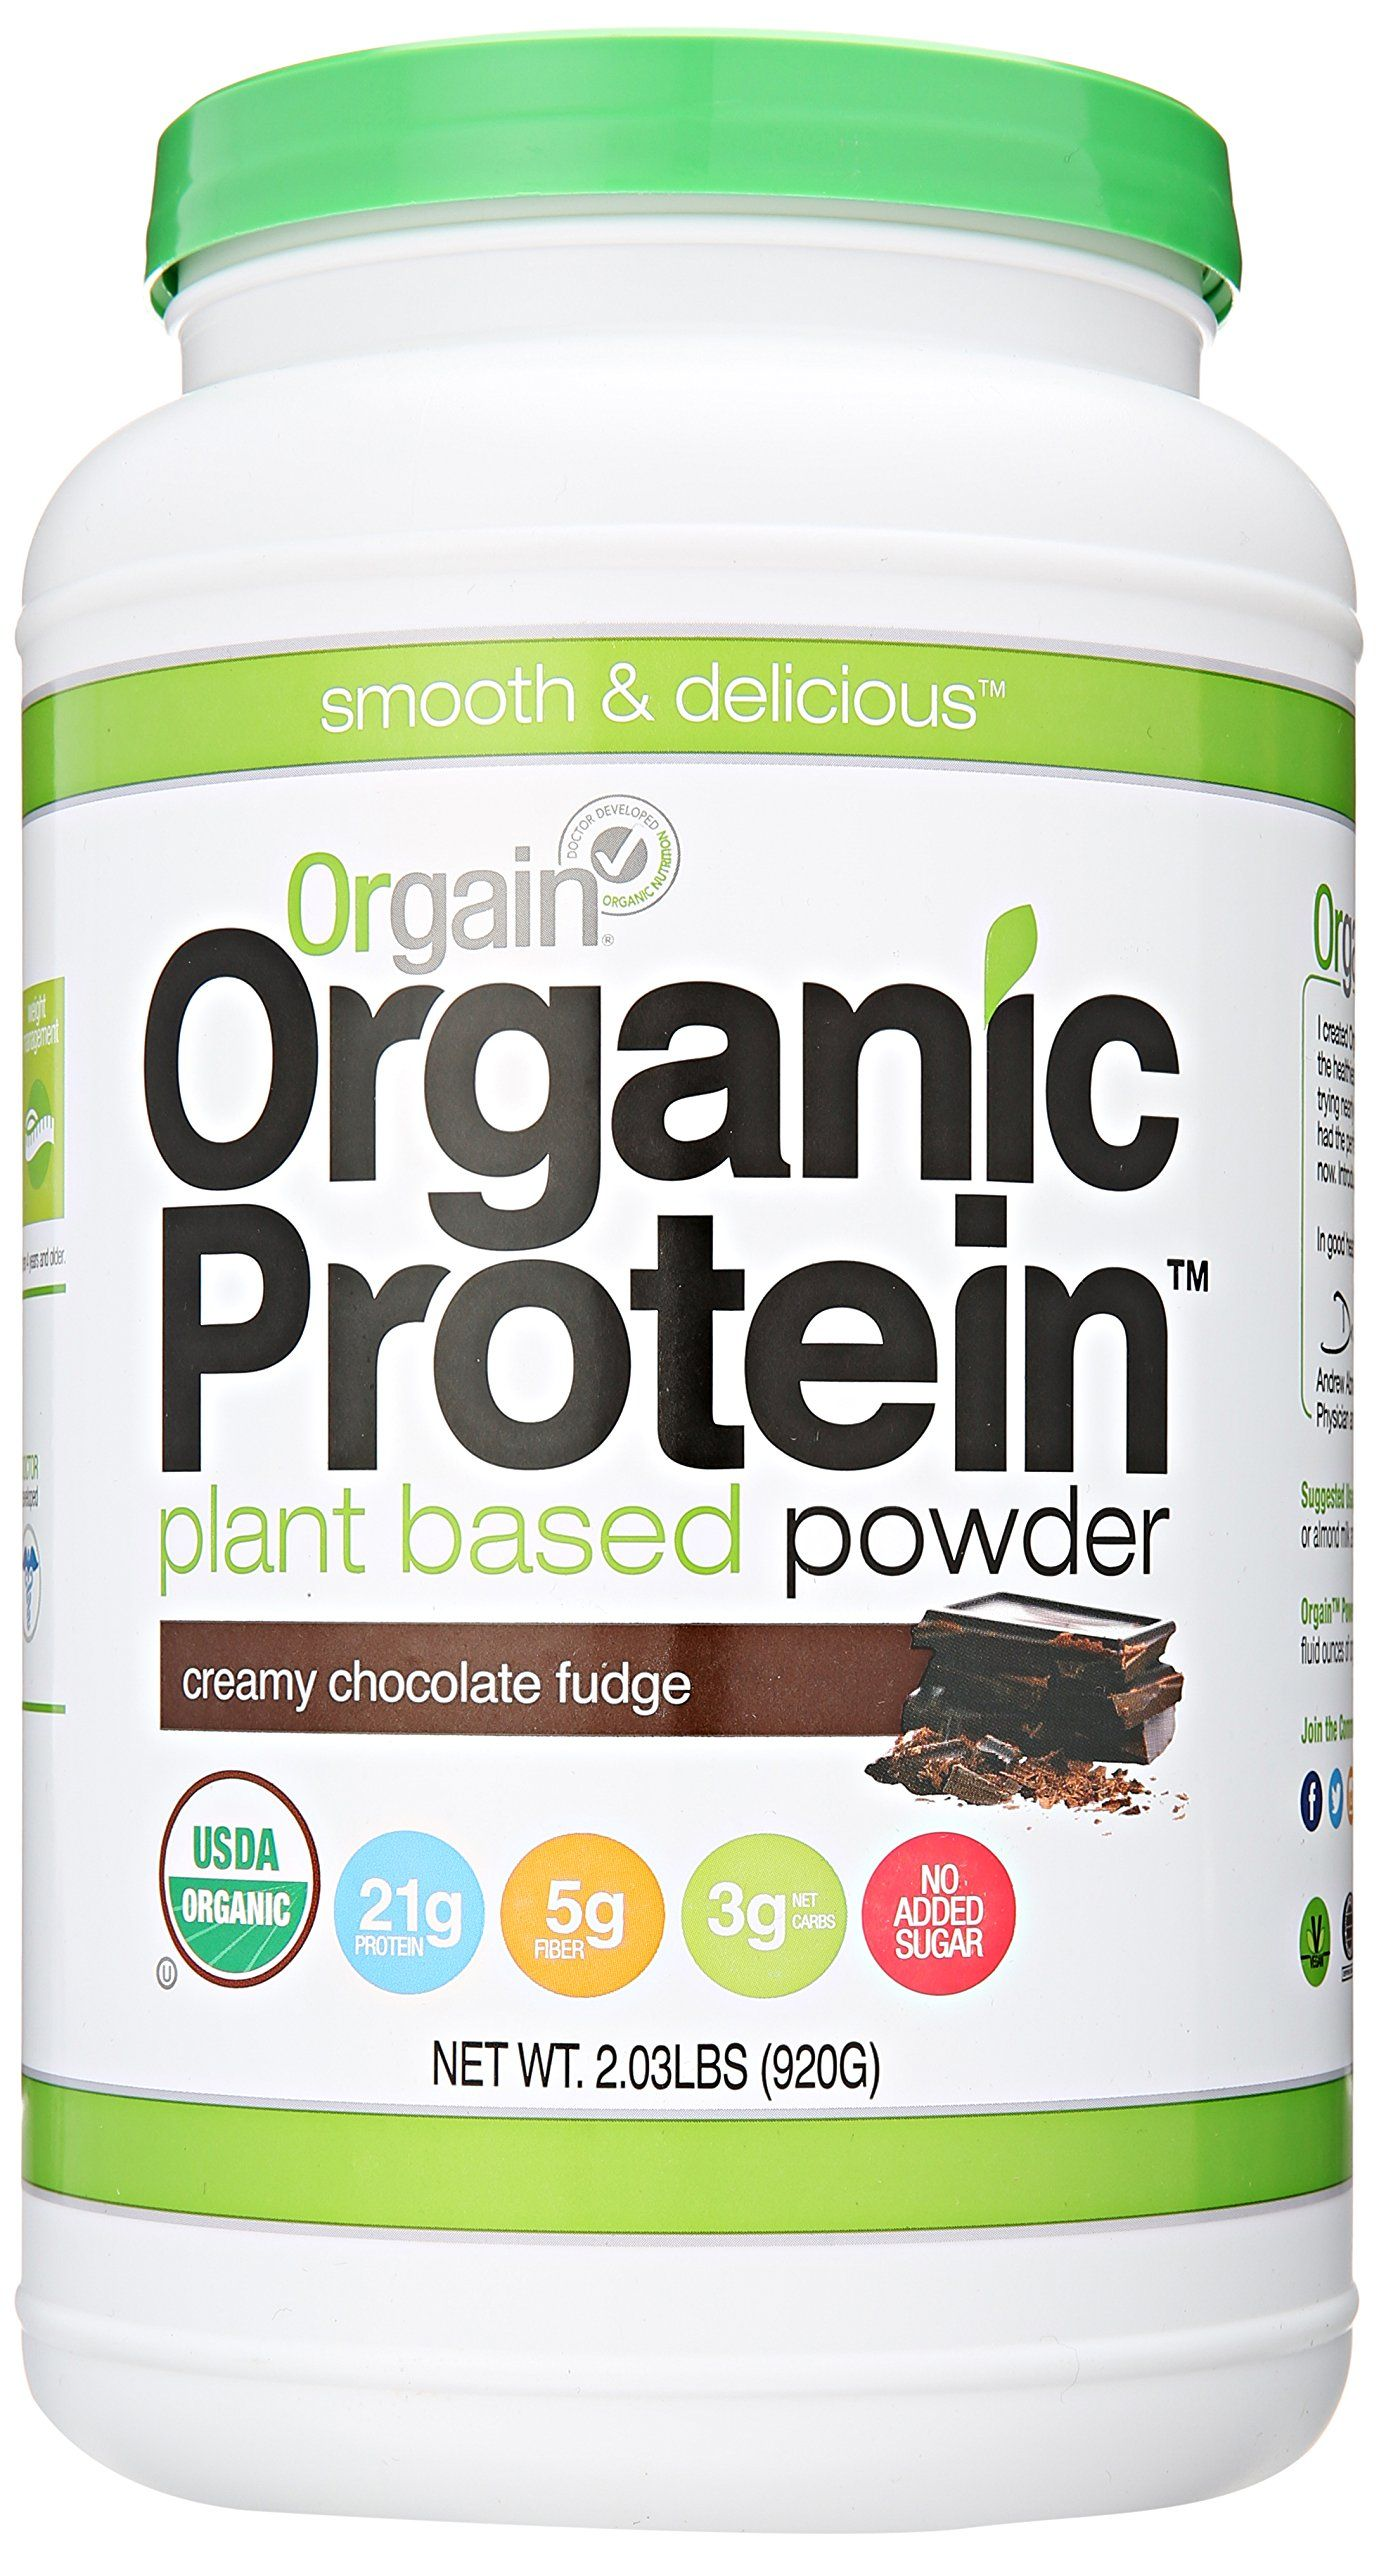 Amazon Com Orgain Organic Protein Plant Based Powder Creamy Chocolate Fudge 2 03 Pound Plant Based Protein Powder Organic Protein Powder Organic Protein